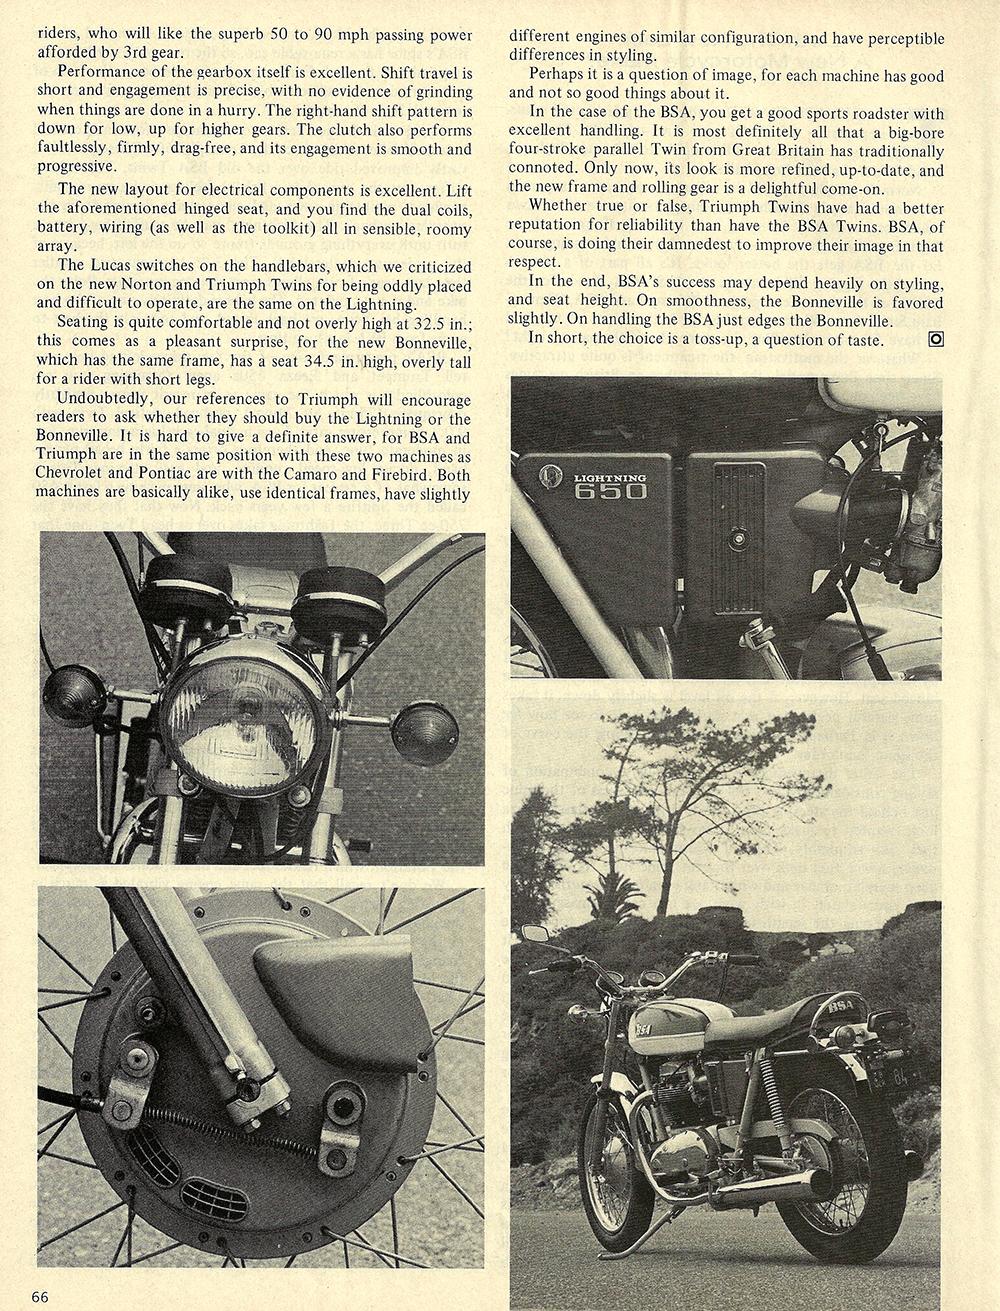 1971 BSA 650 Lightning road test 03.jpg